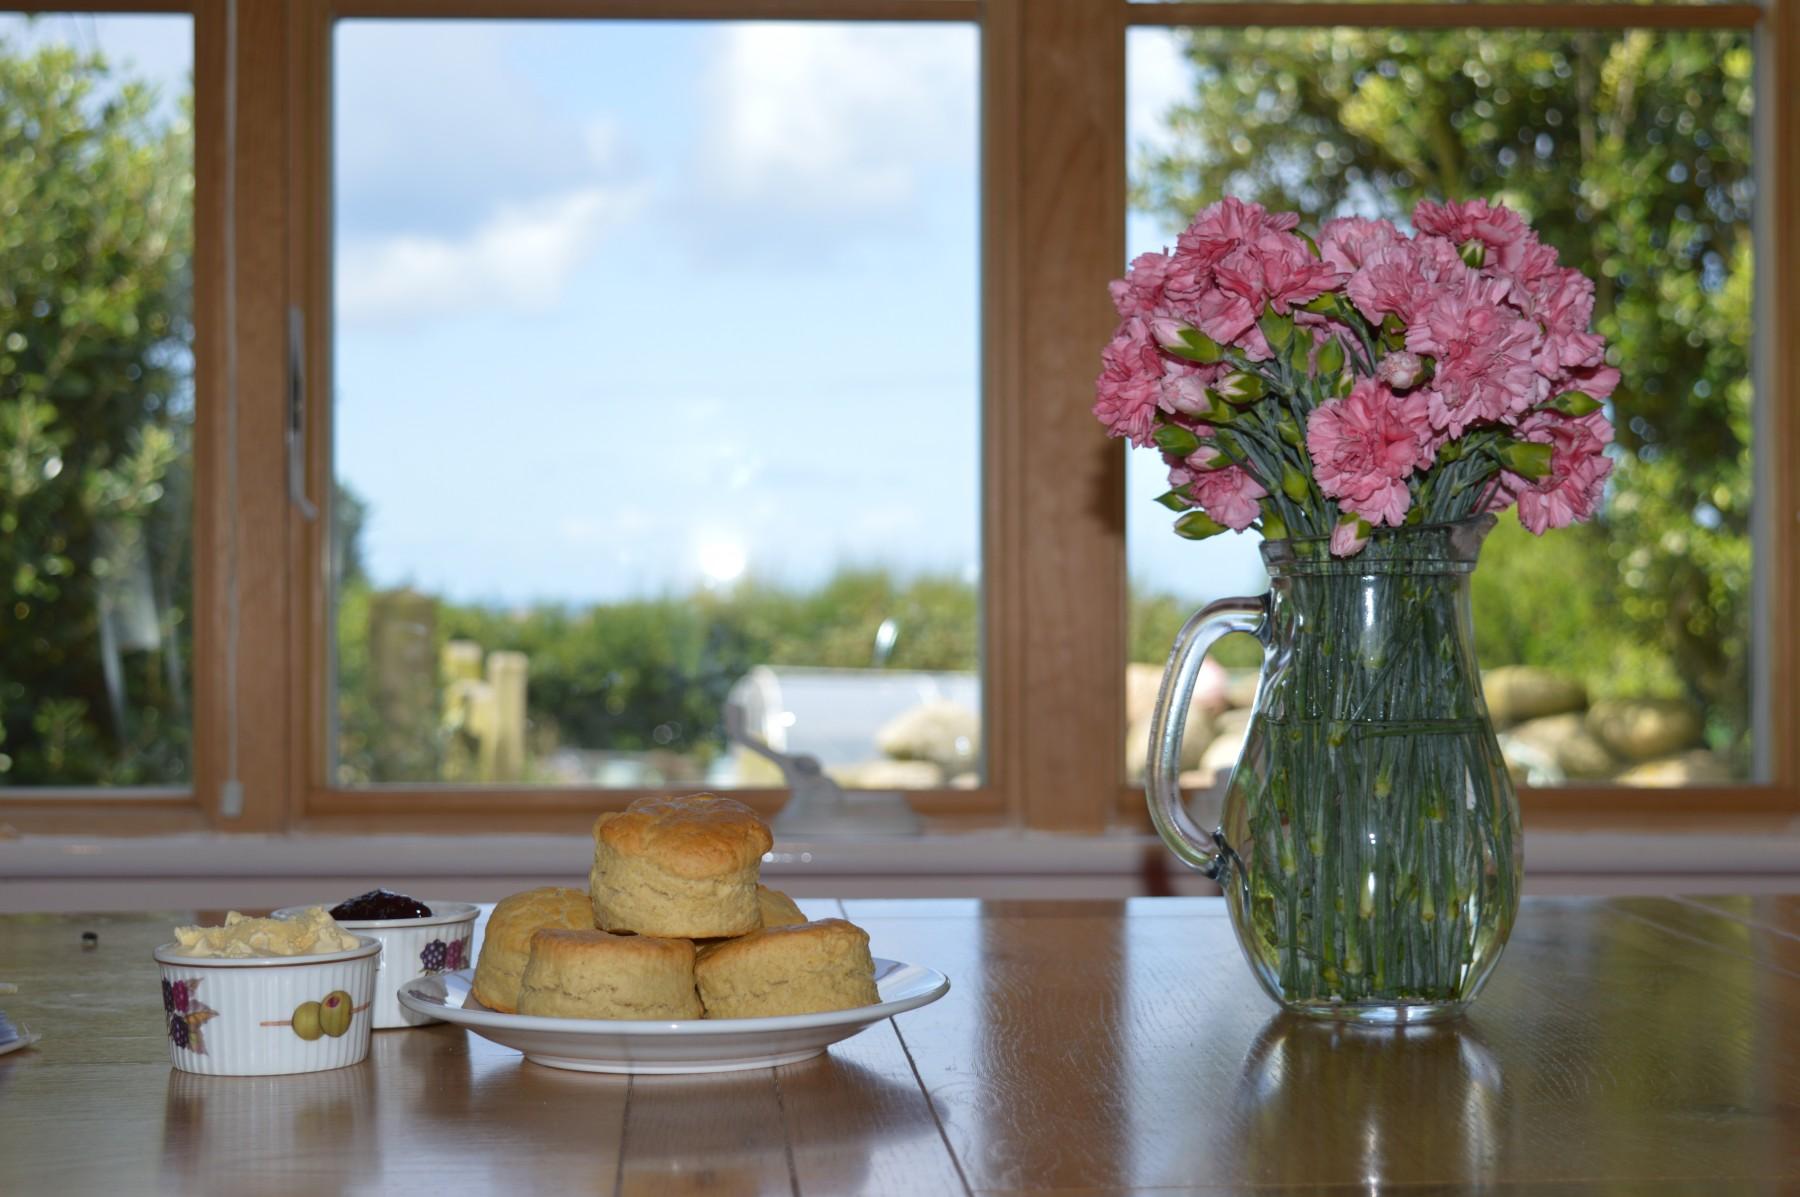 The Croft cream tea and flowers